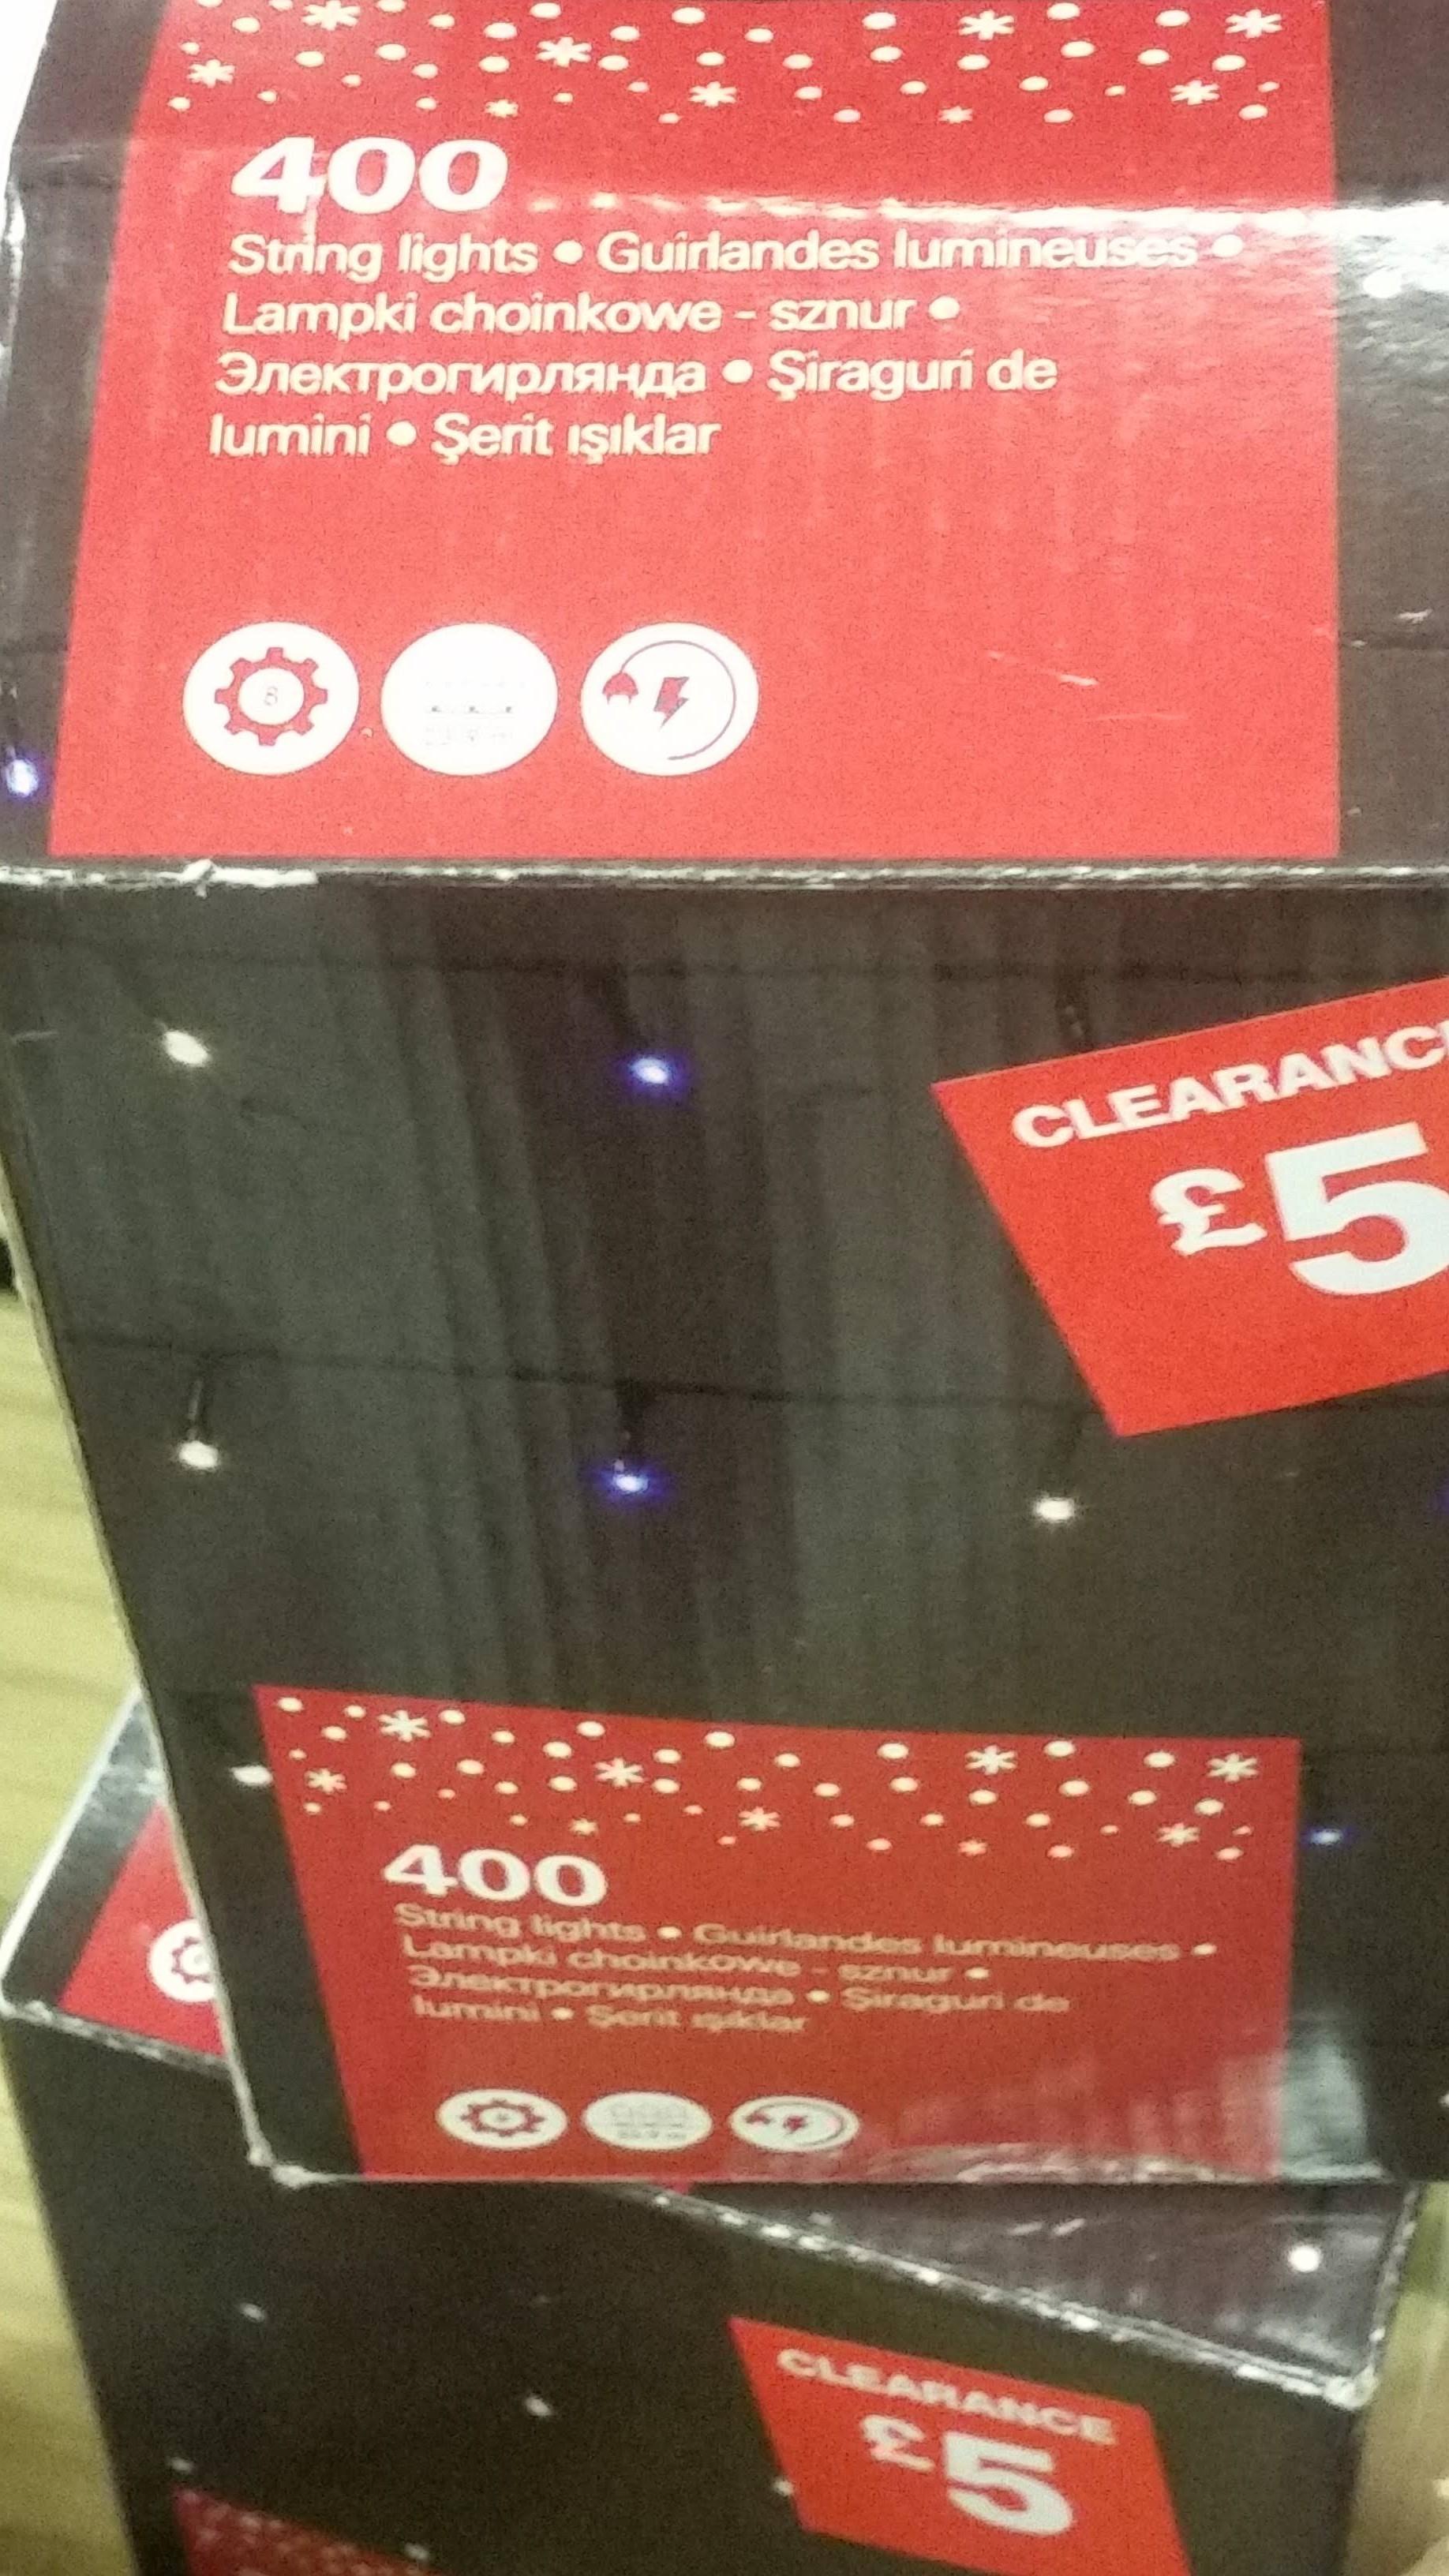 B&Q  400 Christmas string lights  £5 /  250 Christmas cluster string lights £8 /720 string lights £15